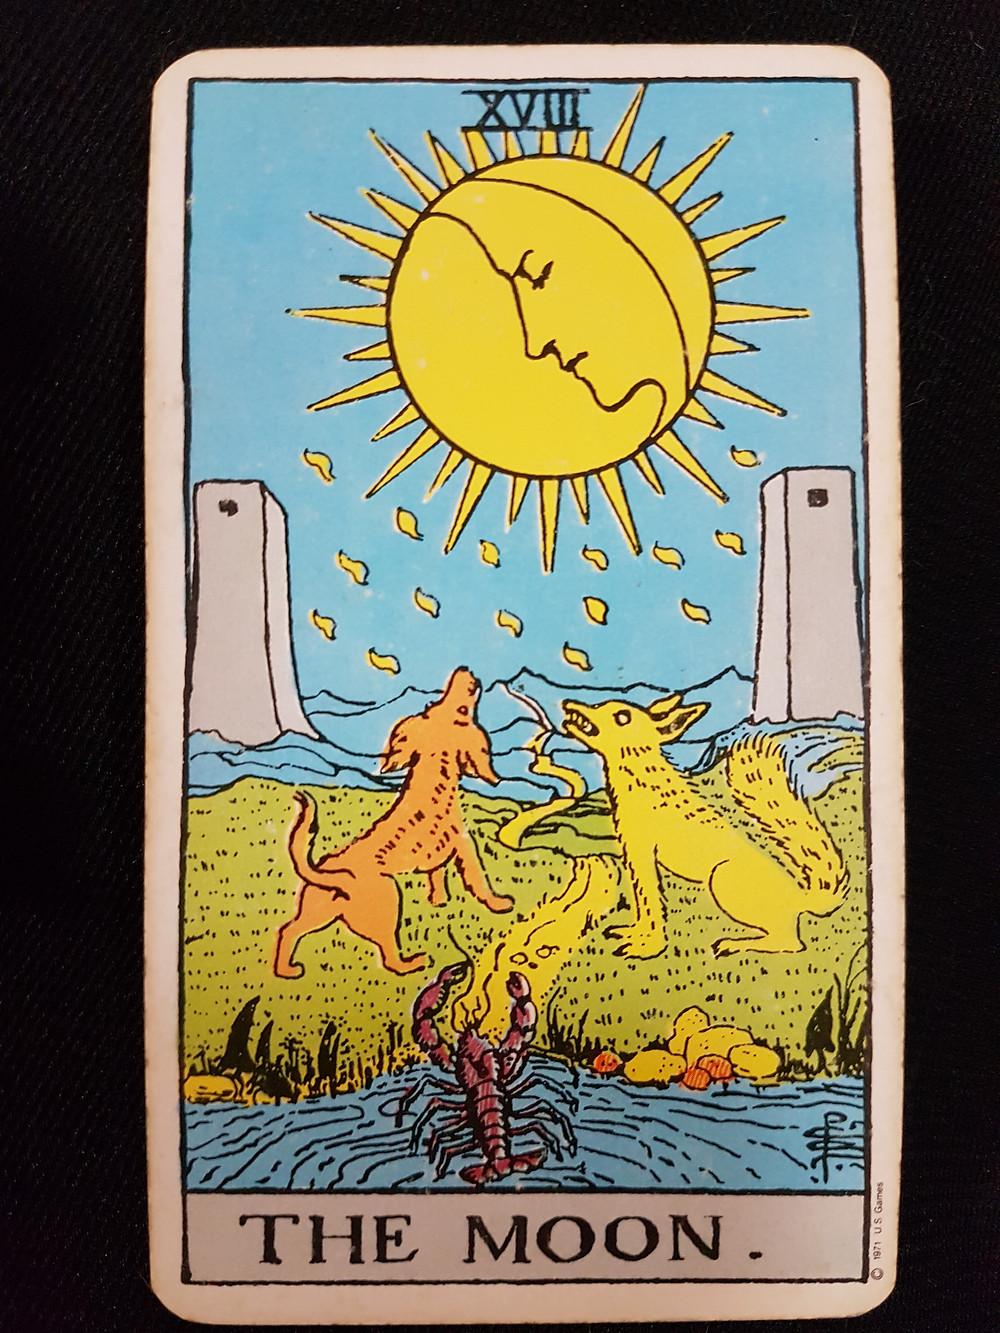 The Moon Card No 18 | lynsreadings.com